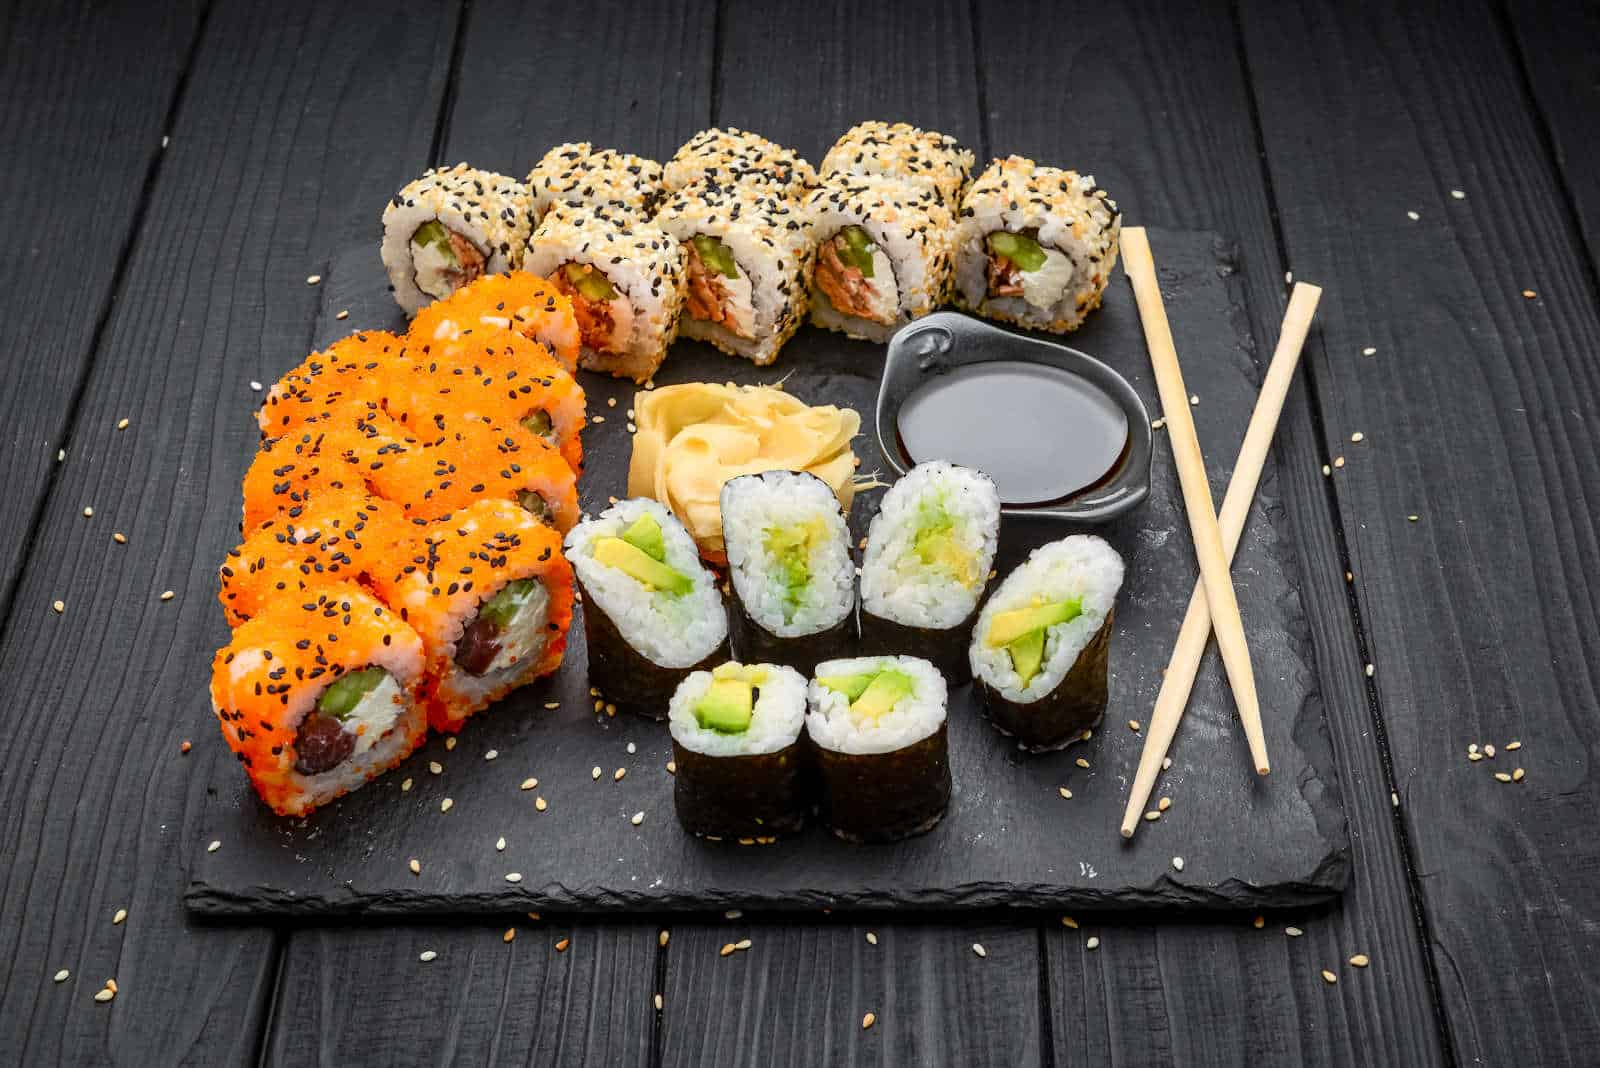 Miku Sushi of Chicago